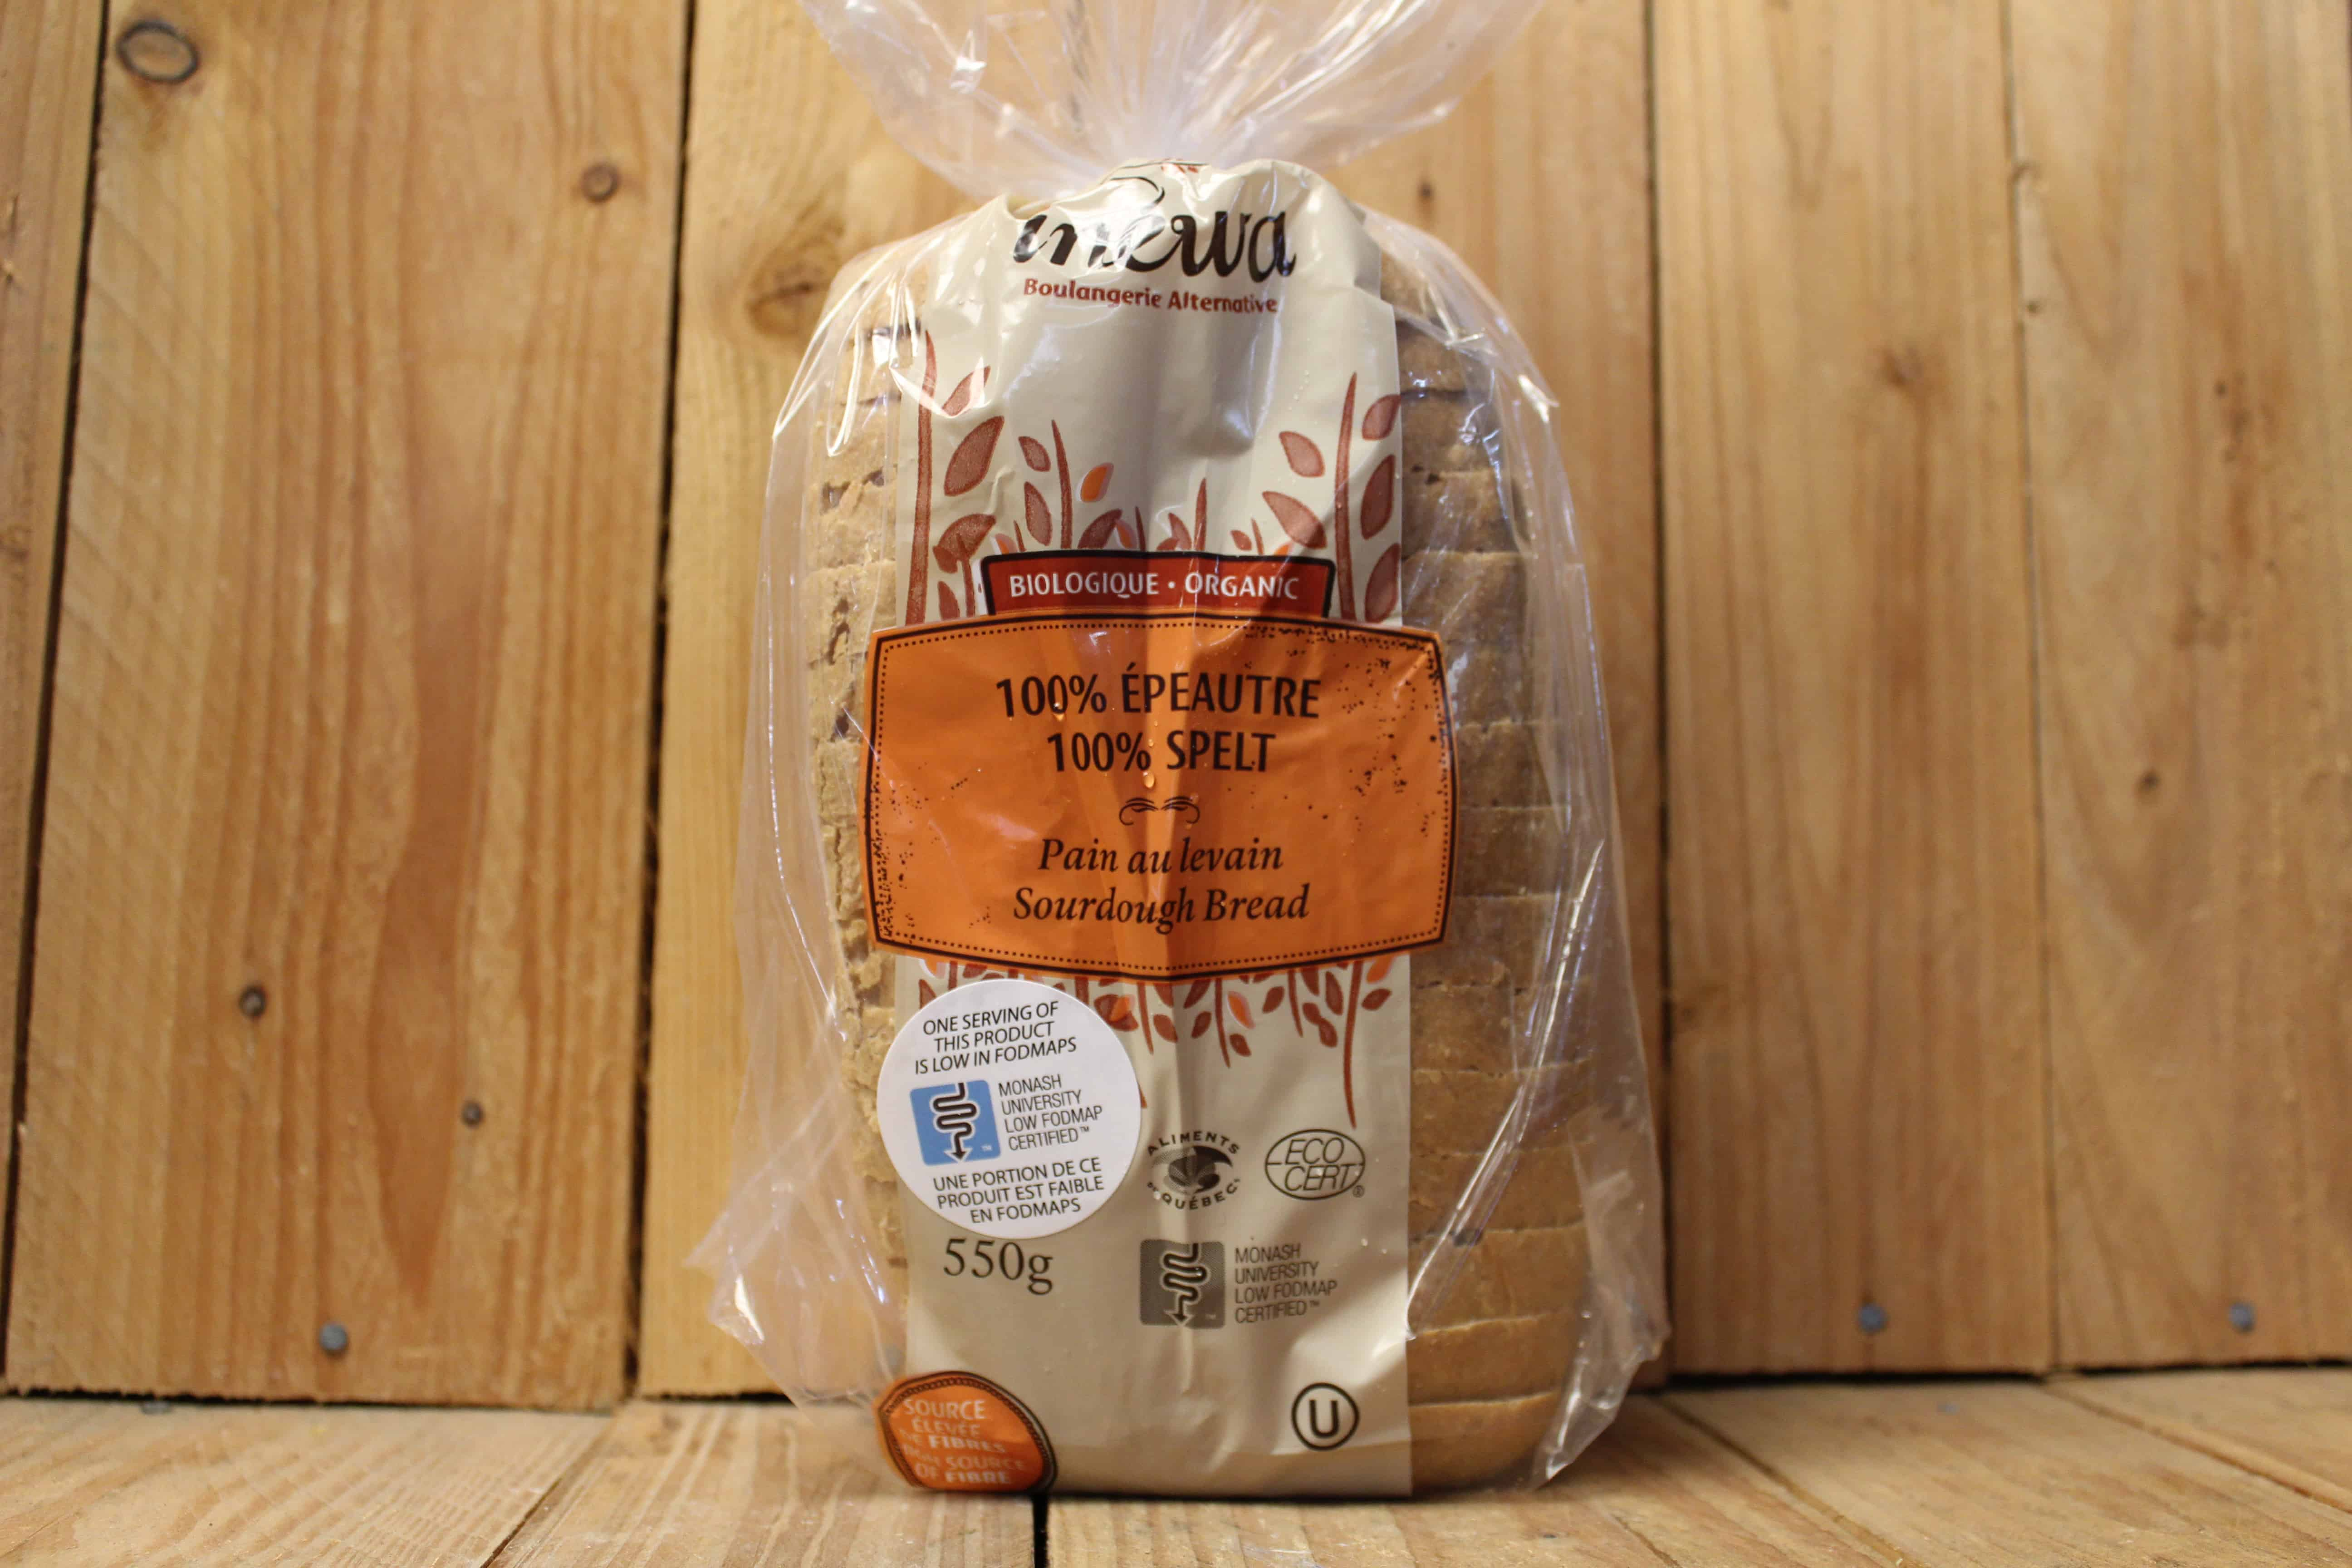 Inewa Bakery – 100% Spelt Sourdough Bread (570g)